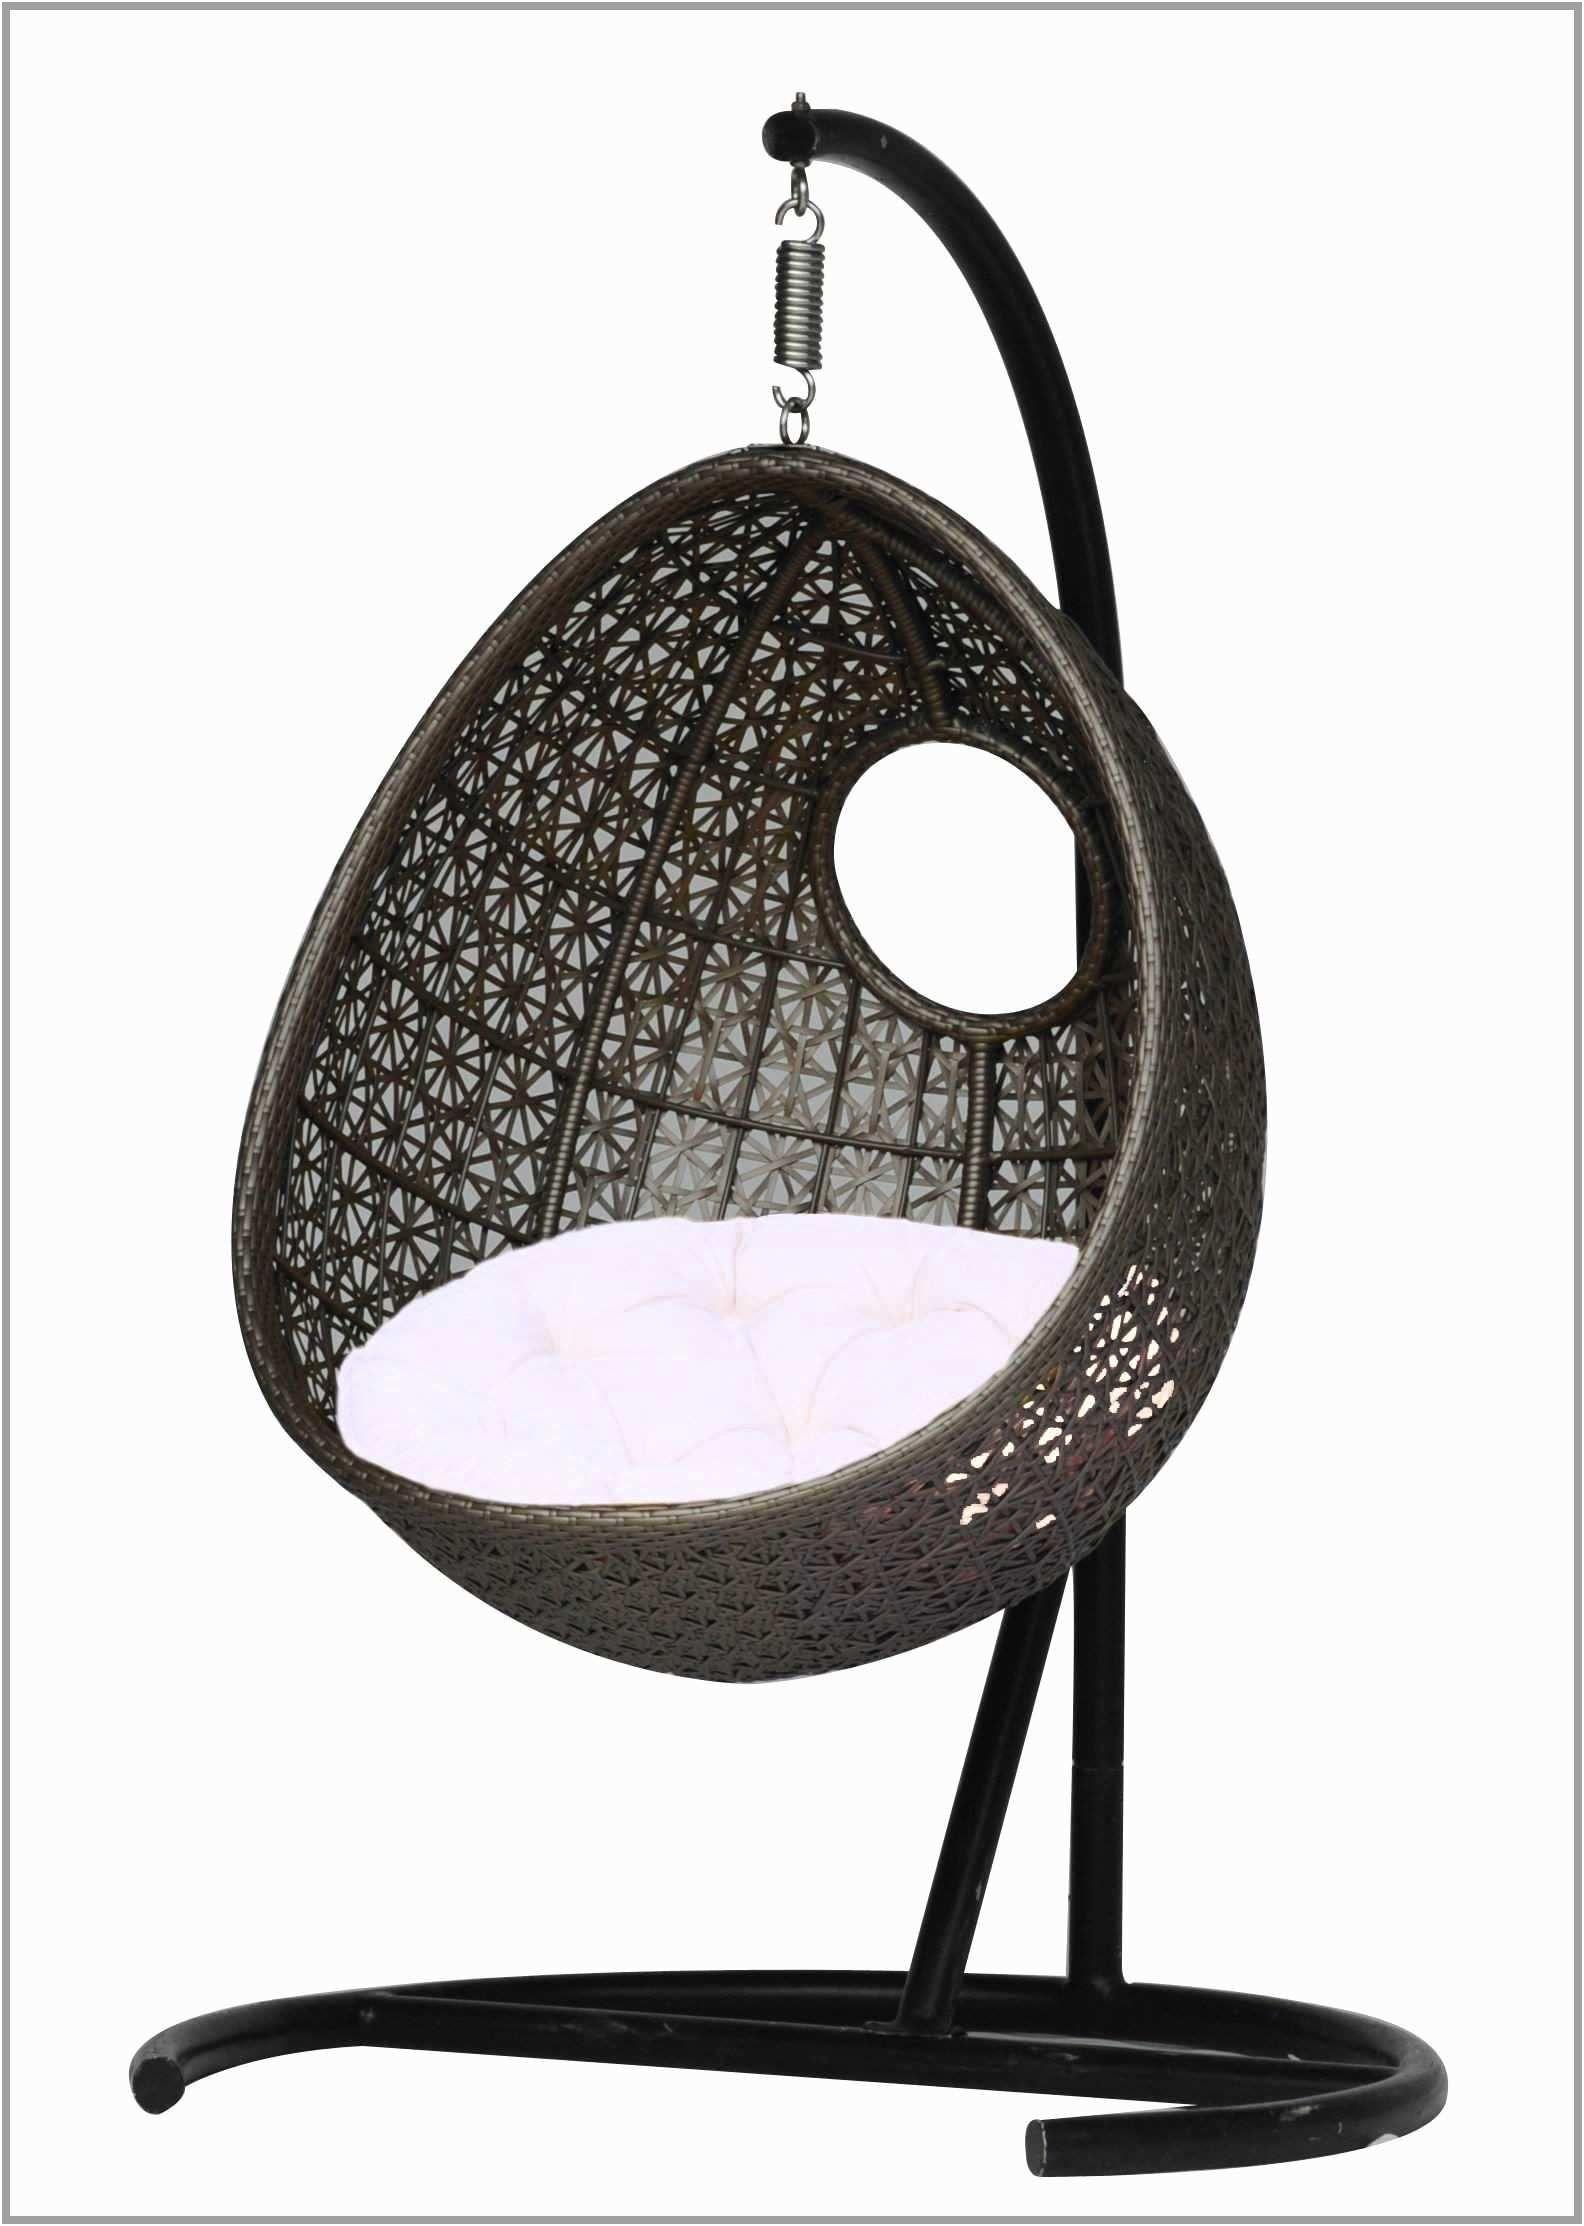 14 Mieux Fauteuil Oeuf Suspendu Ikea Collection | Swinging destiné Chaise Suspendue Ikea